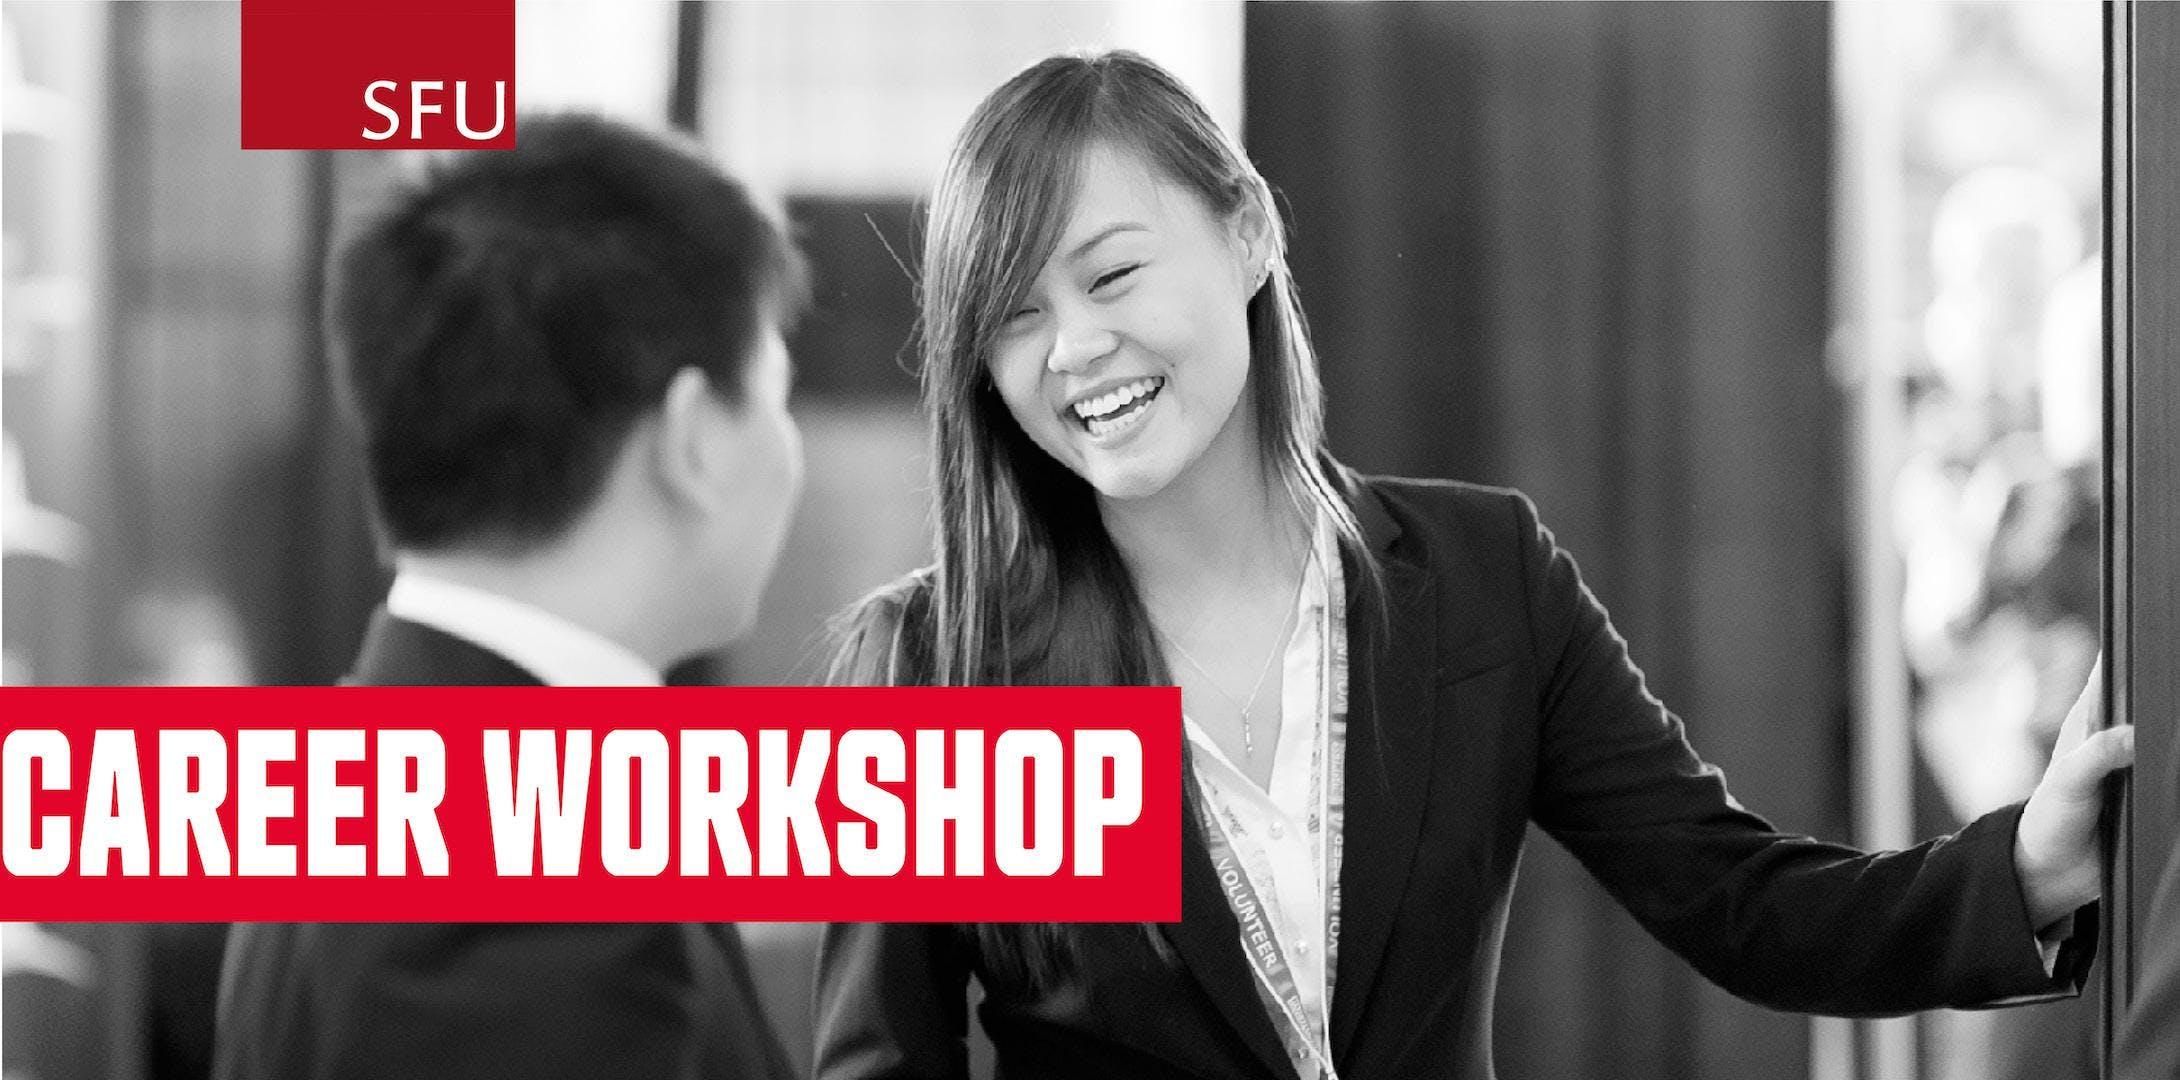 Career Workshop Networking Skills